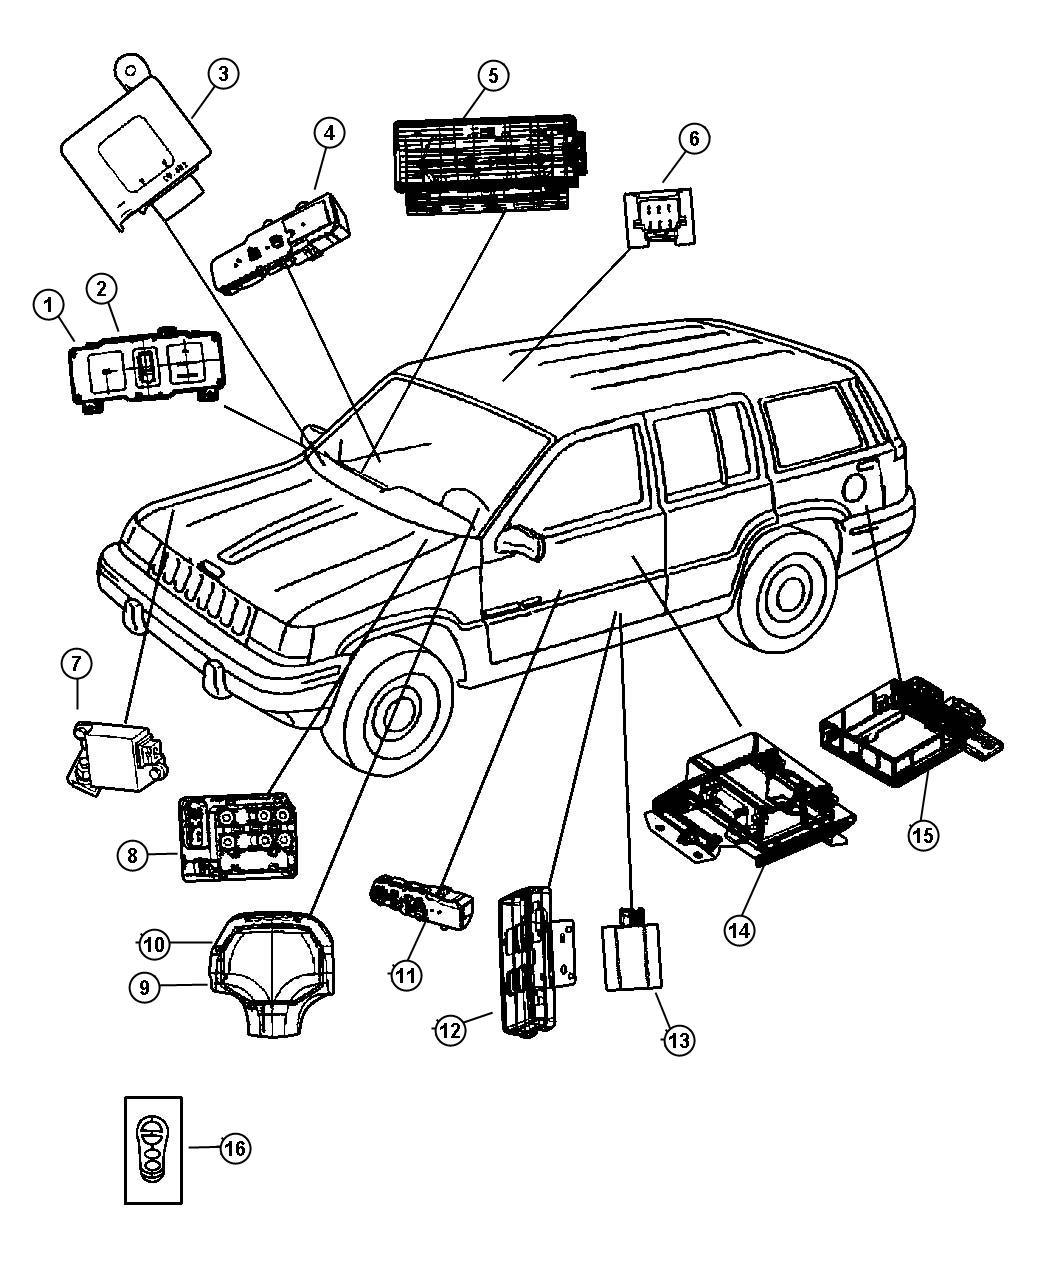 Jeep Grand Cherokee Alarm Fuse Location